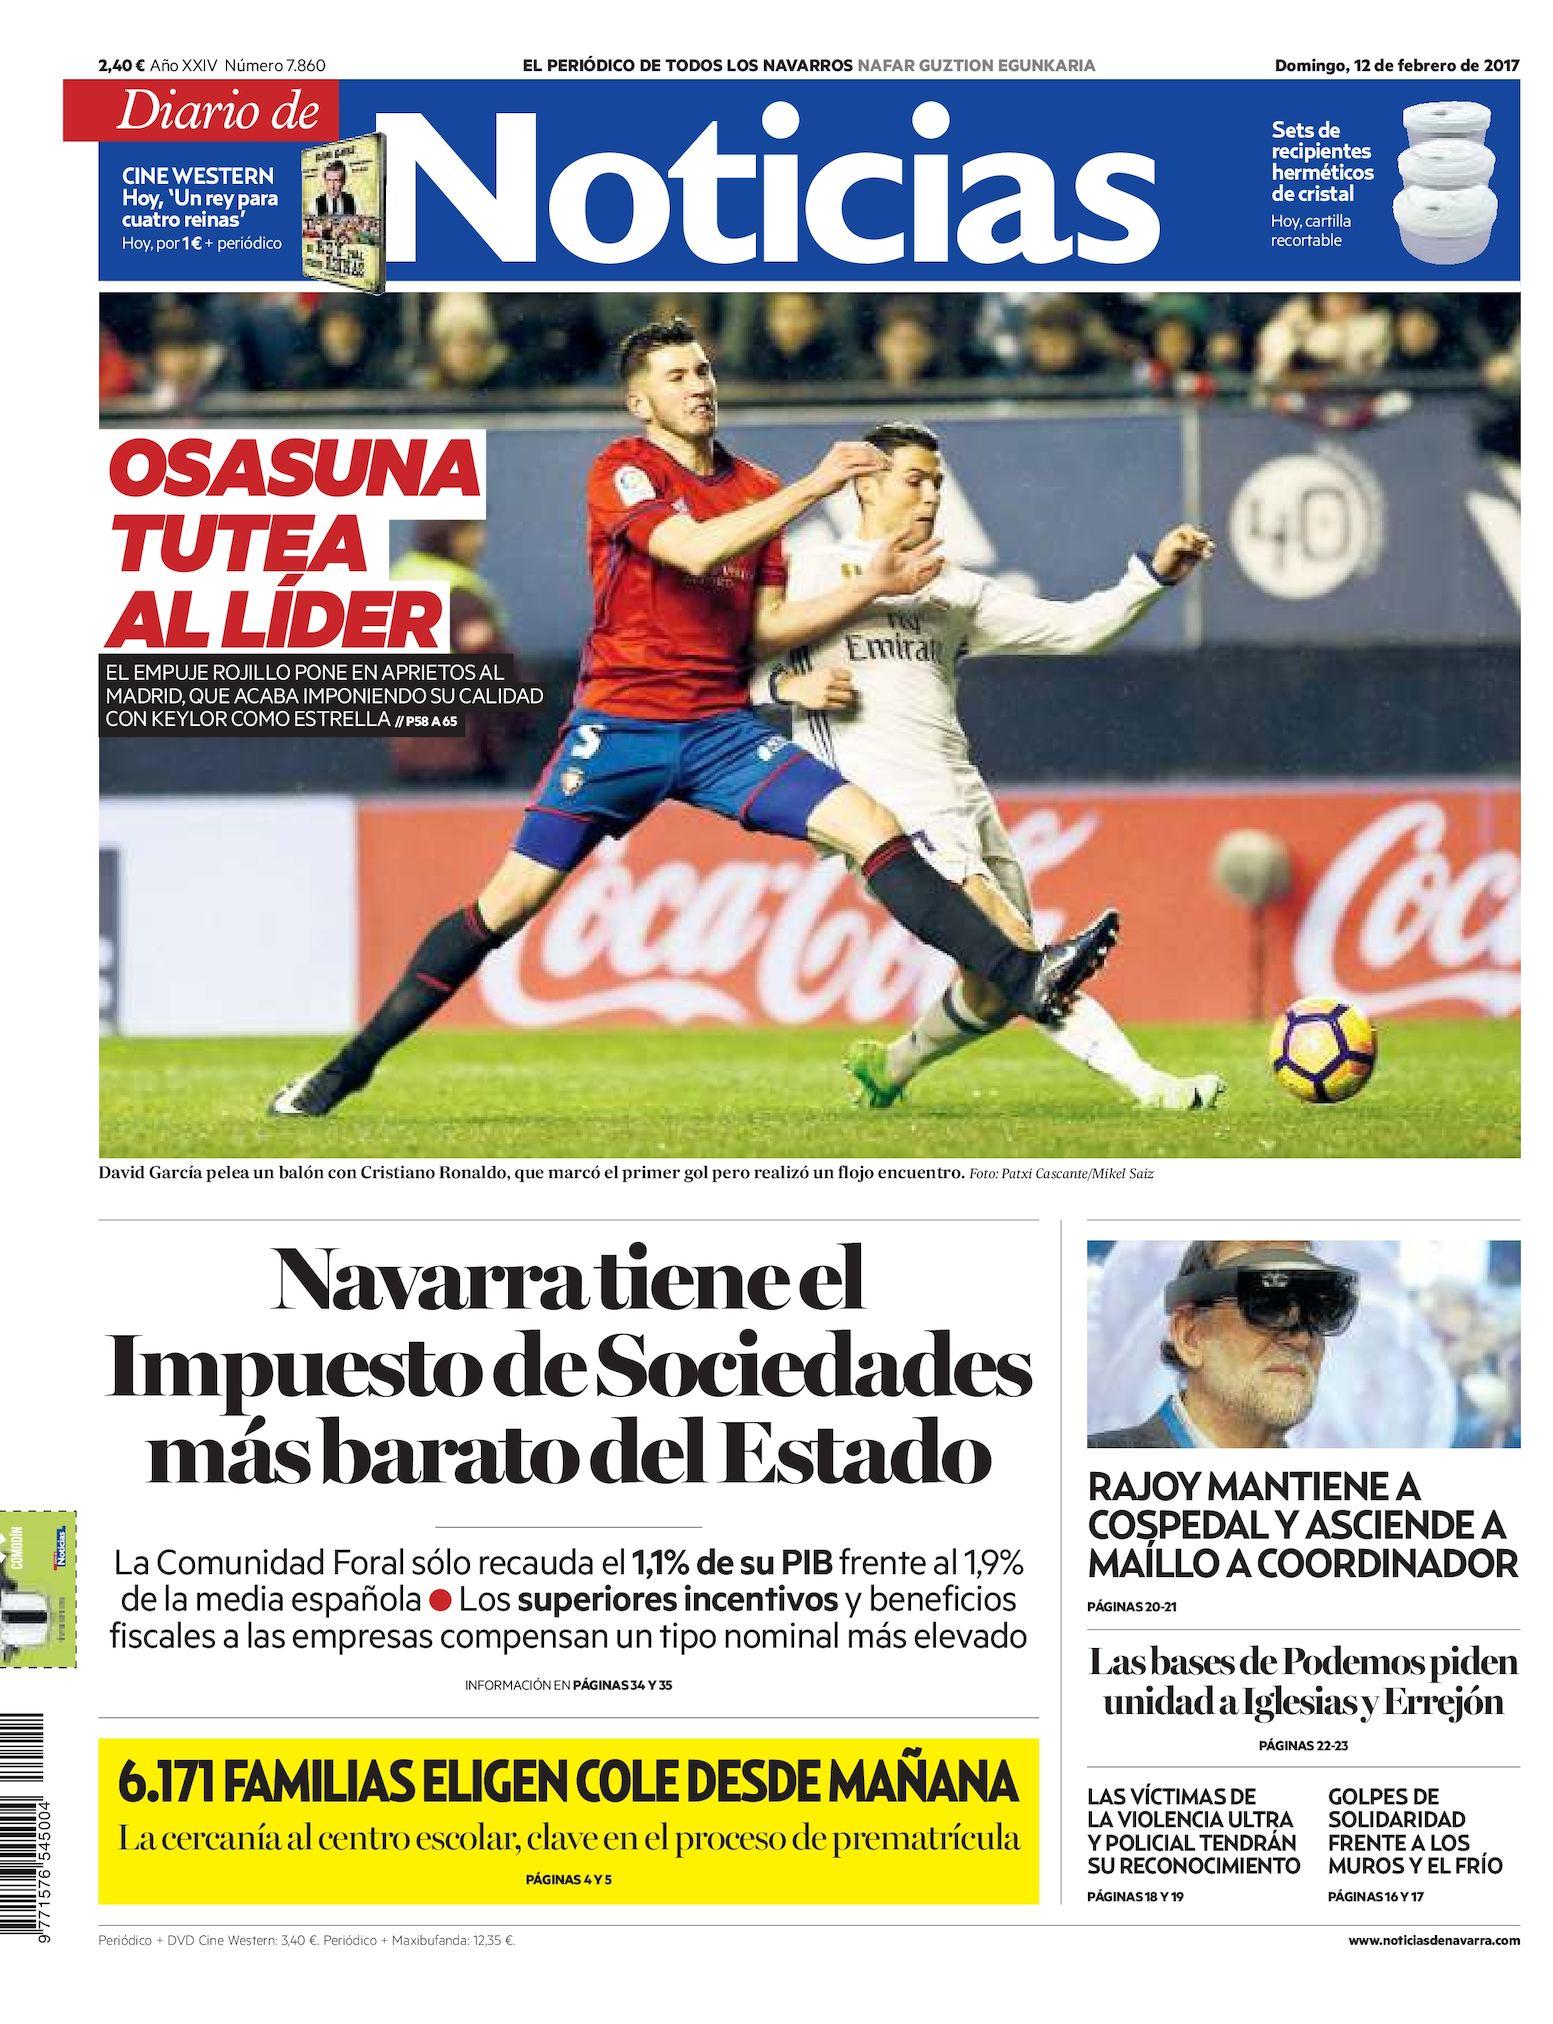 fd2deb34f8 Calaméo - Diario de Noticias 20170212